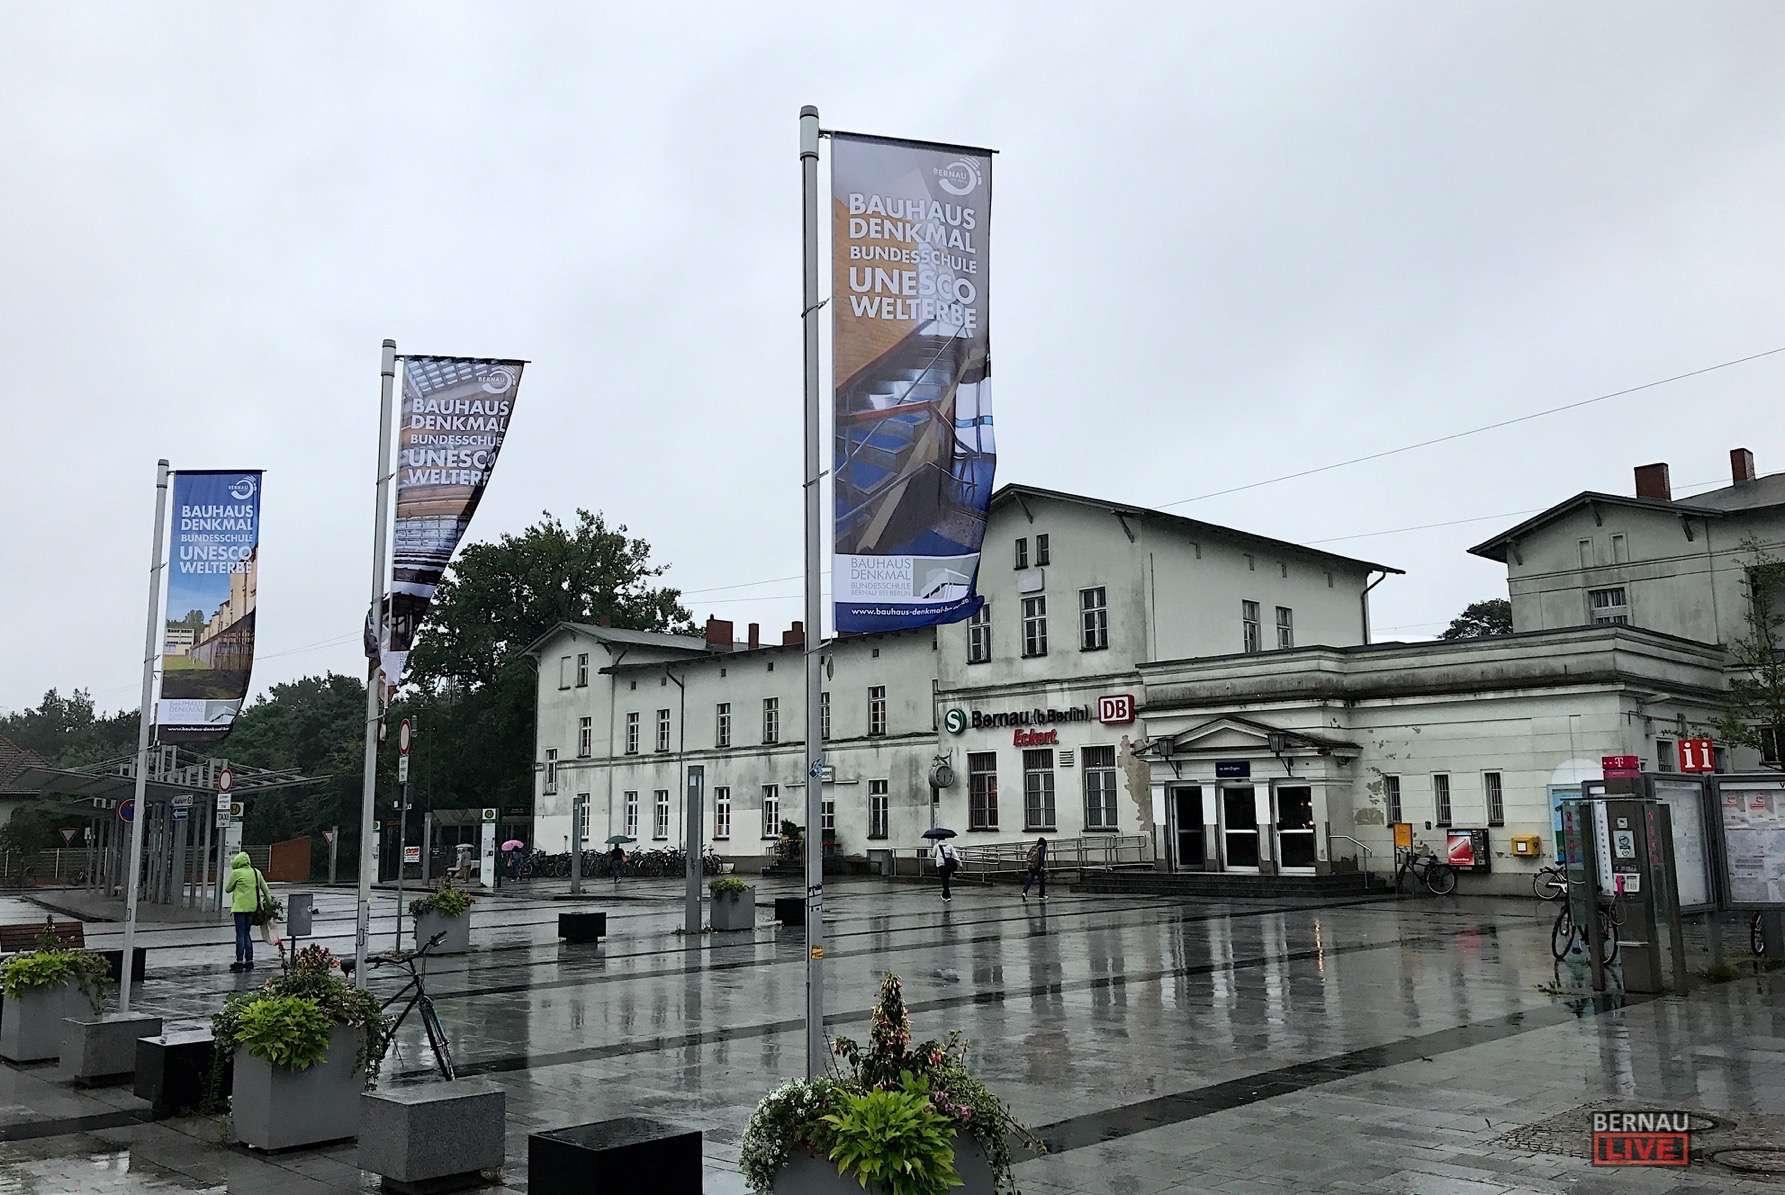 Bernau - Barnim: Dunkel, Sprühregen, aber zum Glück ist Freitag